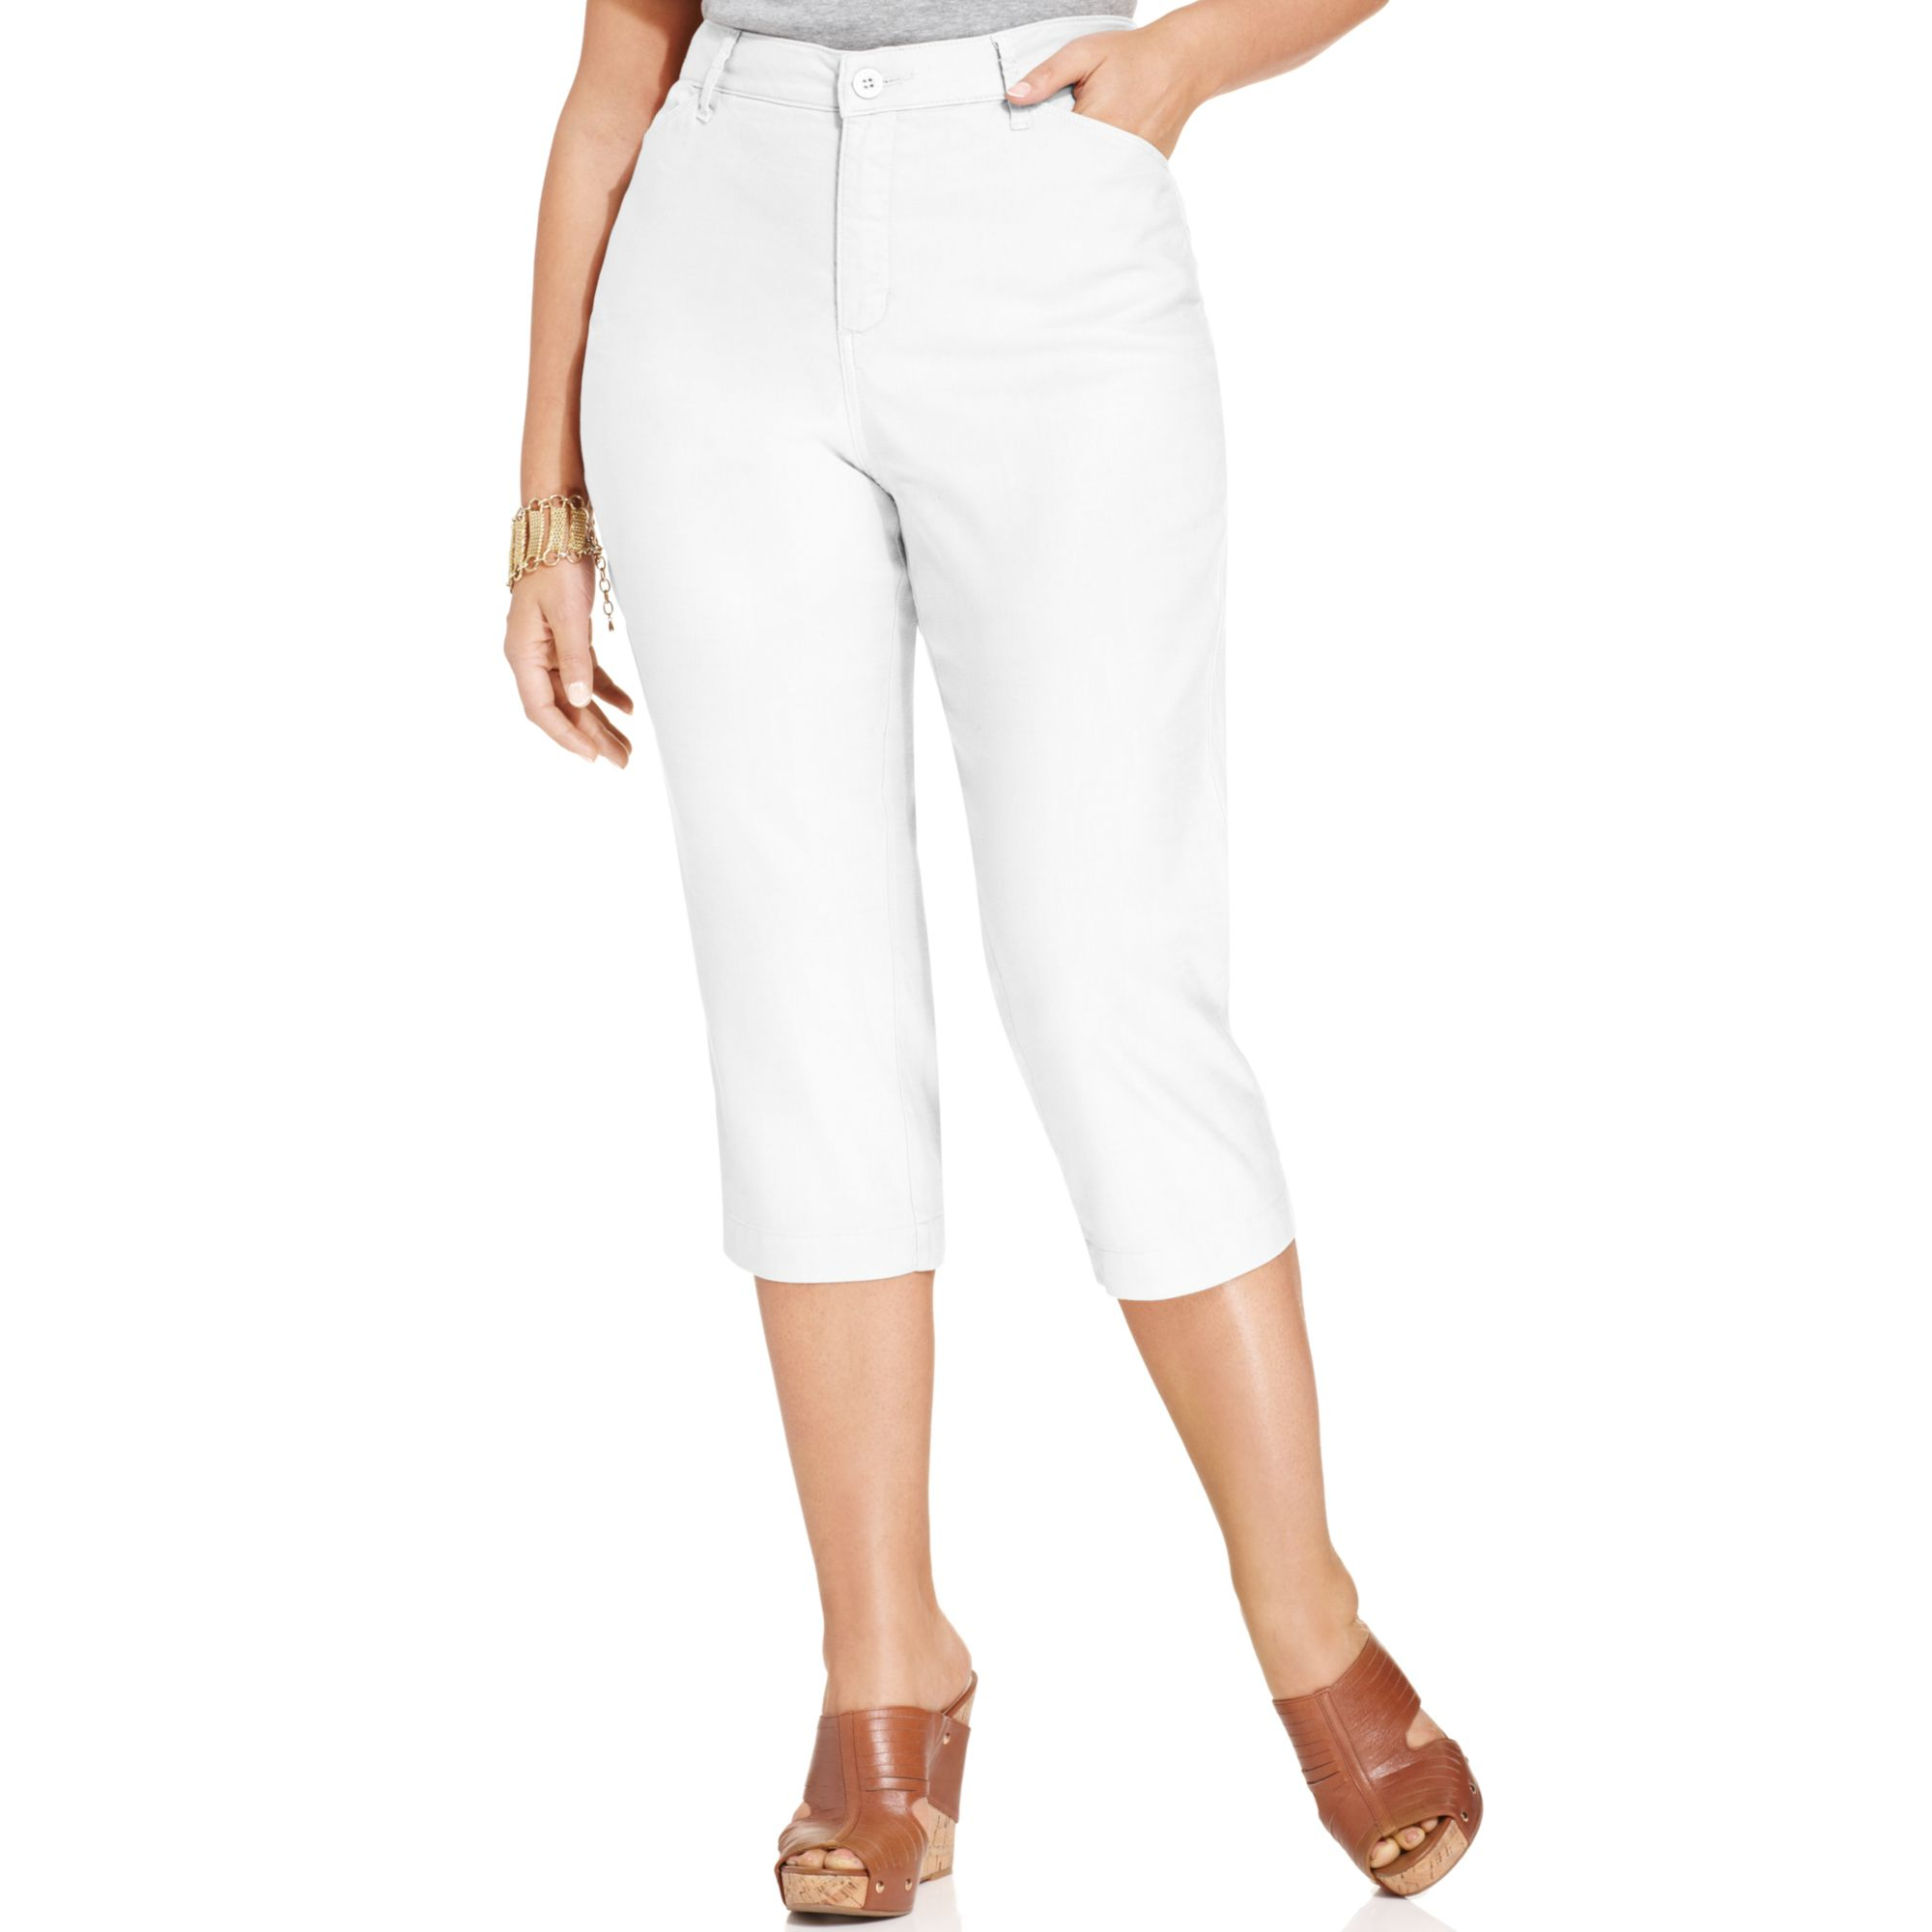 Lyst - Nydj Plus Size Tatum Linen Cropped Pants in White